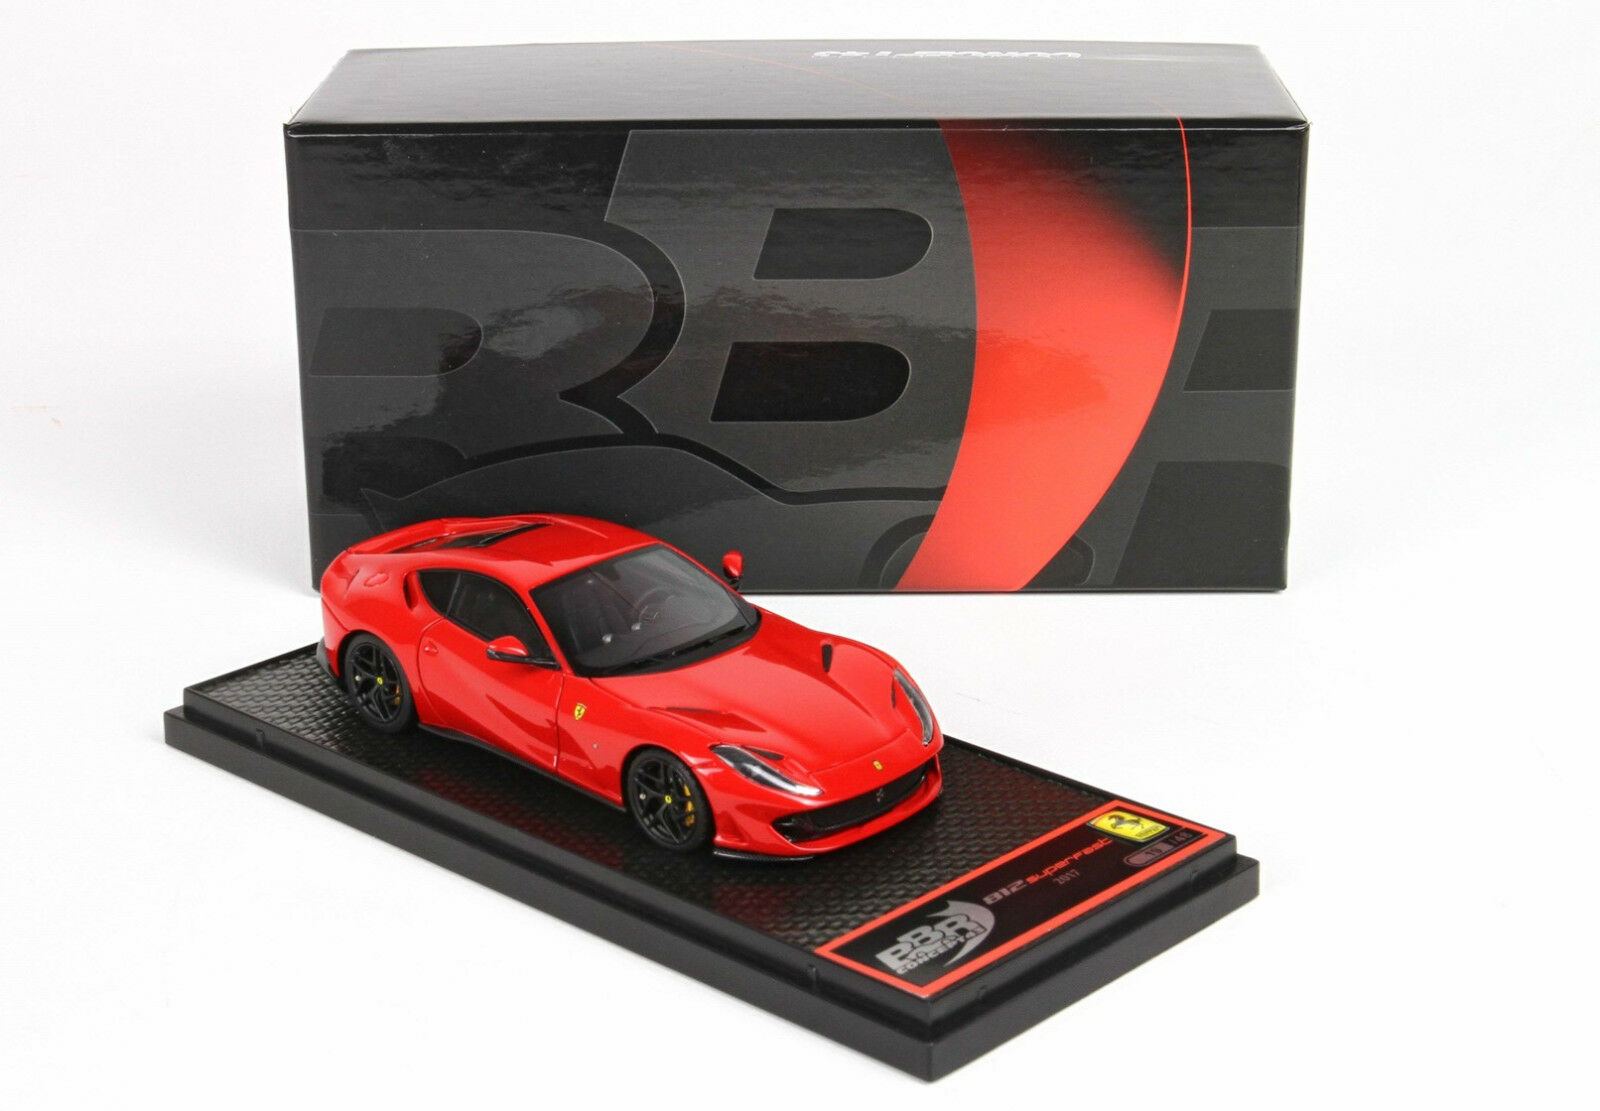 FERRARI 812 SUPERFAST 2017 red Corsa 1 43 lim.ed. 48 pcs BBRC198RCC1